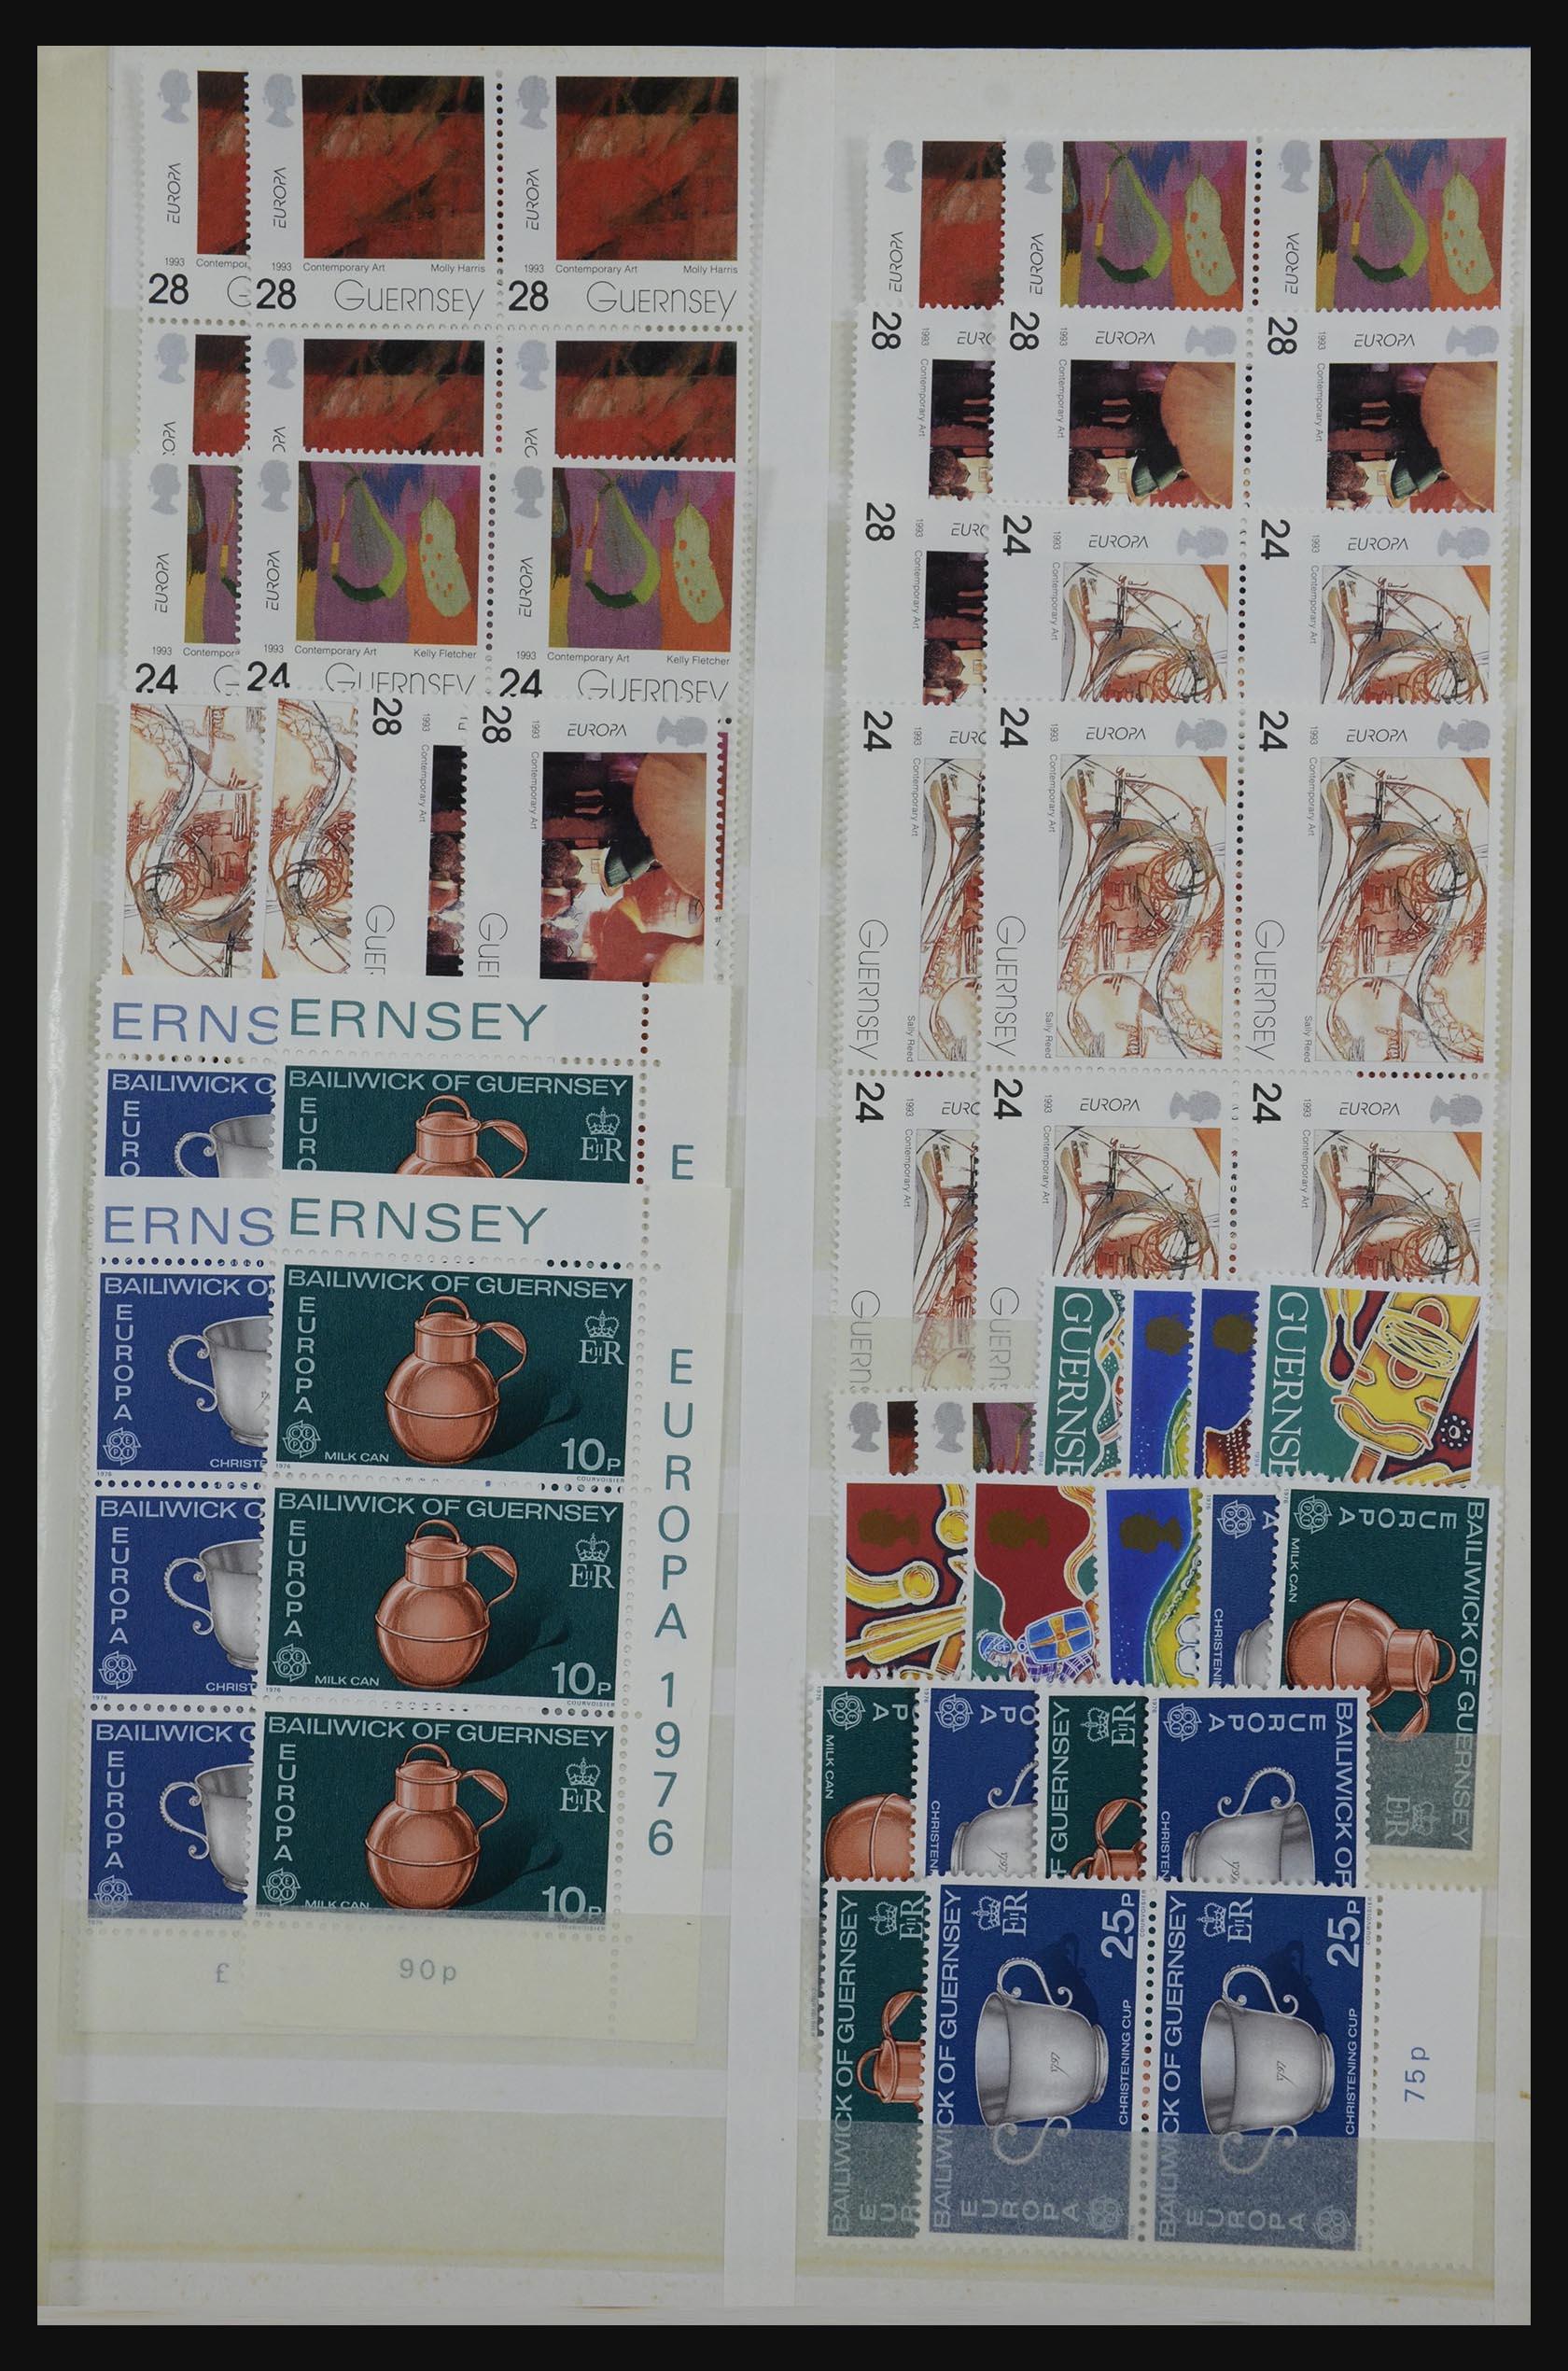 32180 005 - 32180 Guernsey 1972-1992.